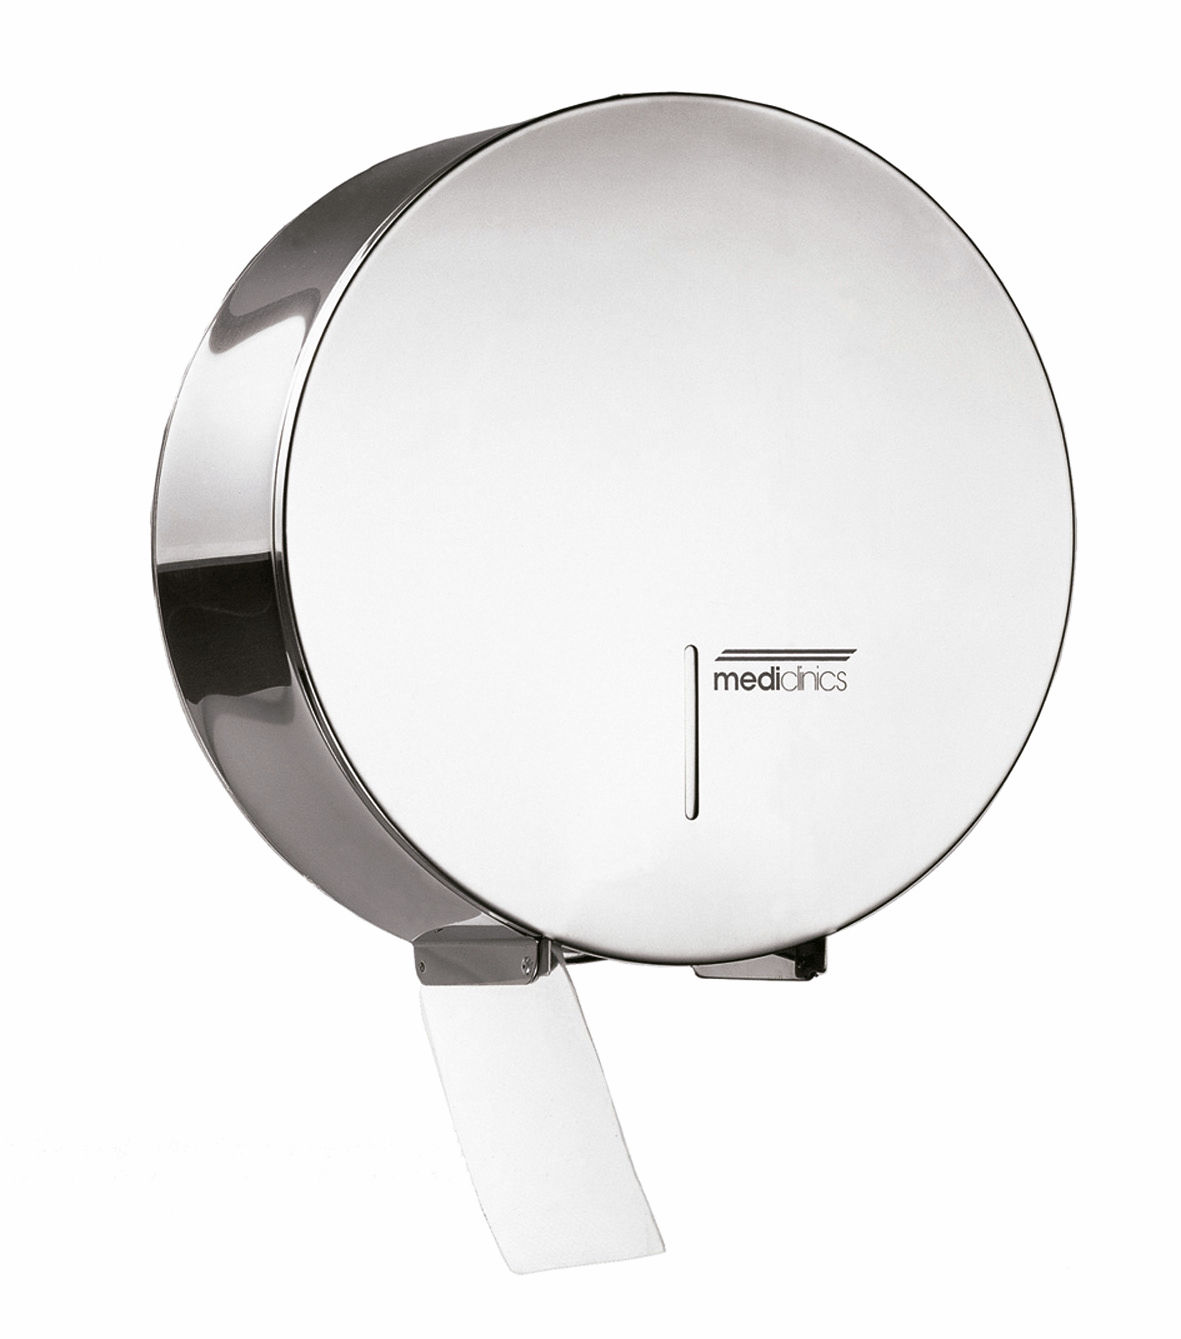 Dérouleur Papier Wc Metal wall-mounted toilet paper dispenser / stainless steel